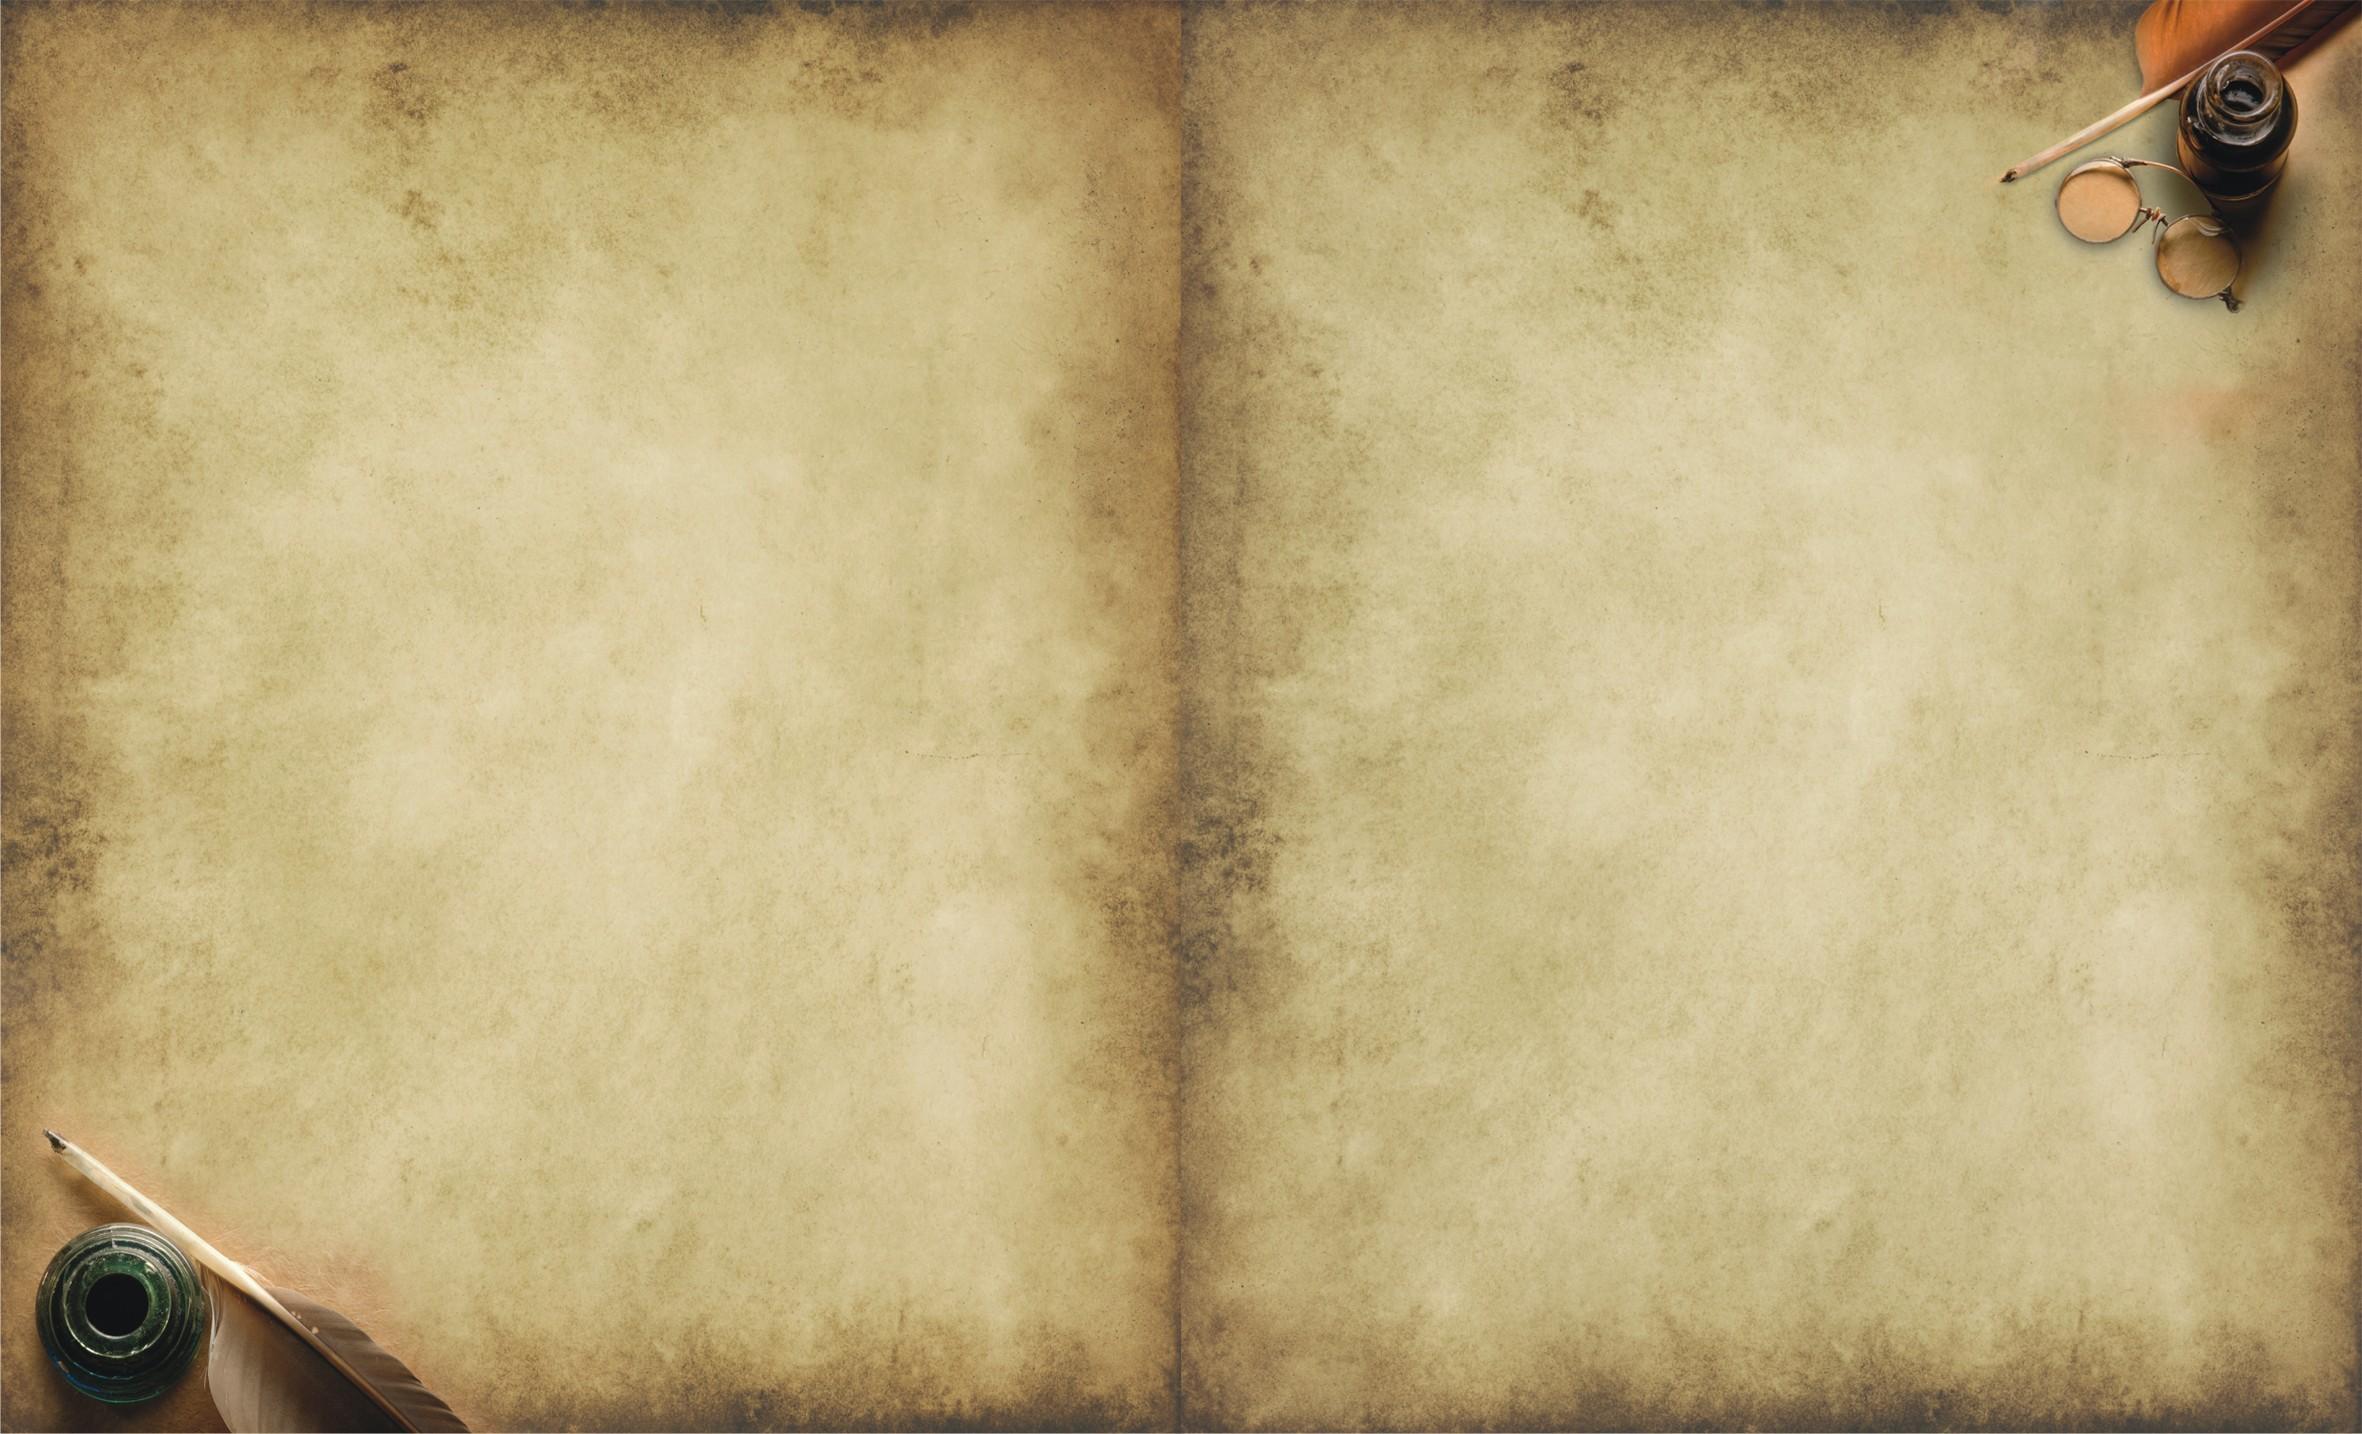 Wallpaper Old Paper ·â'